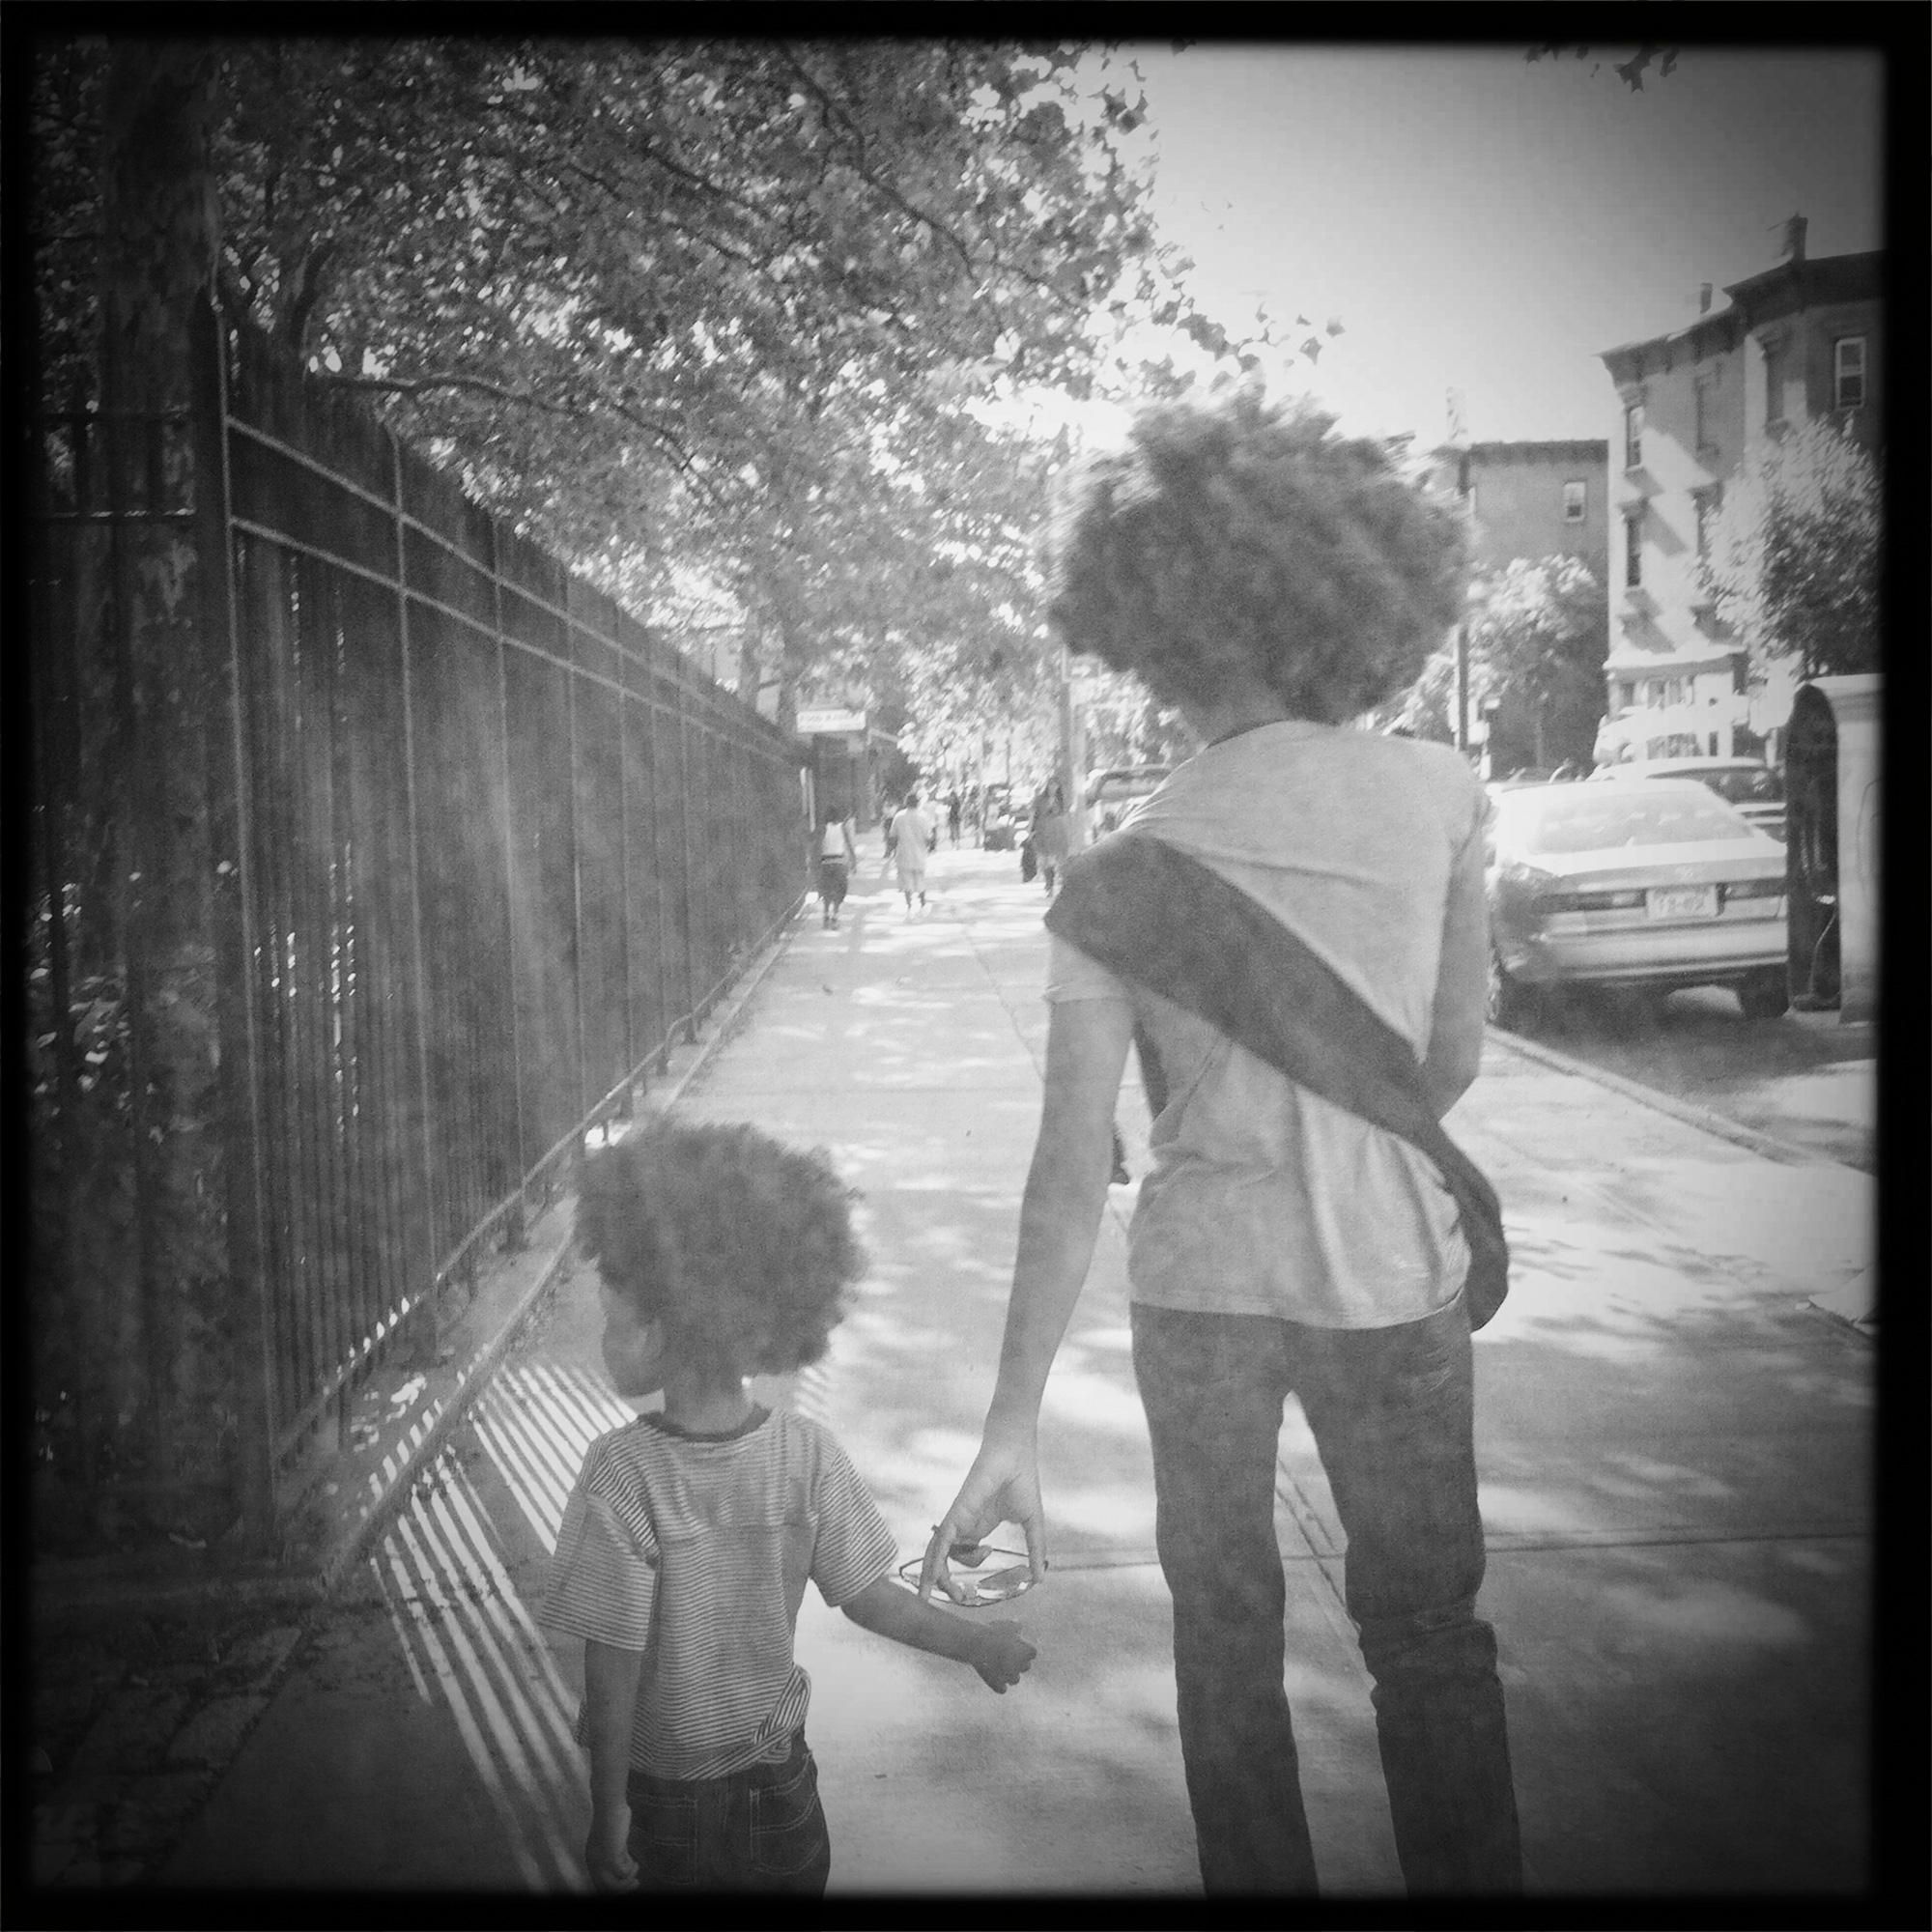 Brooklyn_Afro_01.jpg